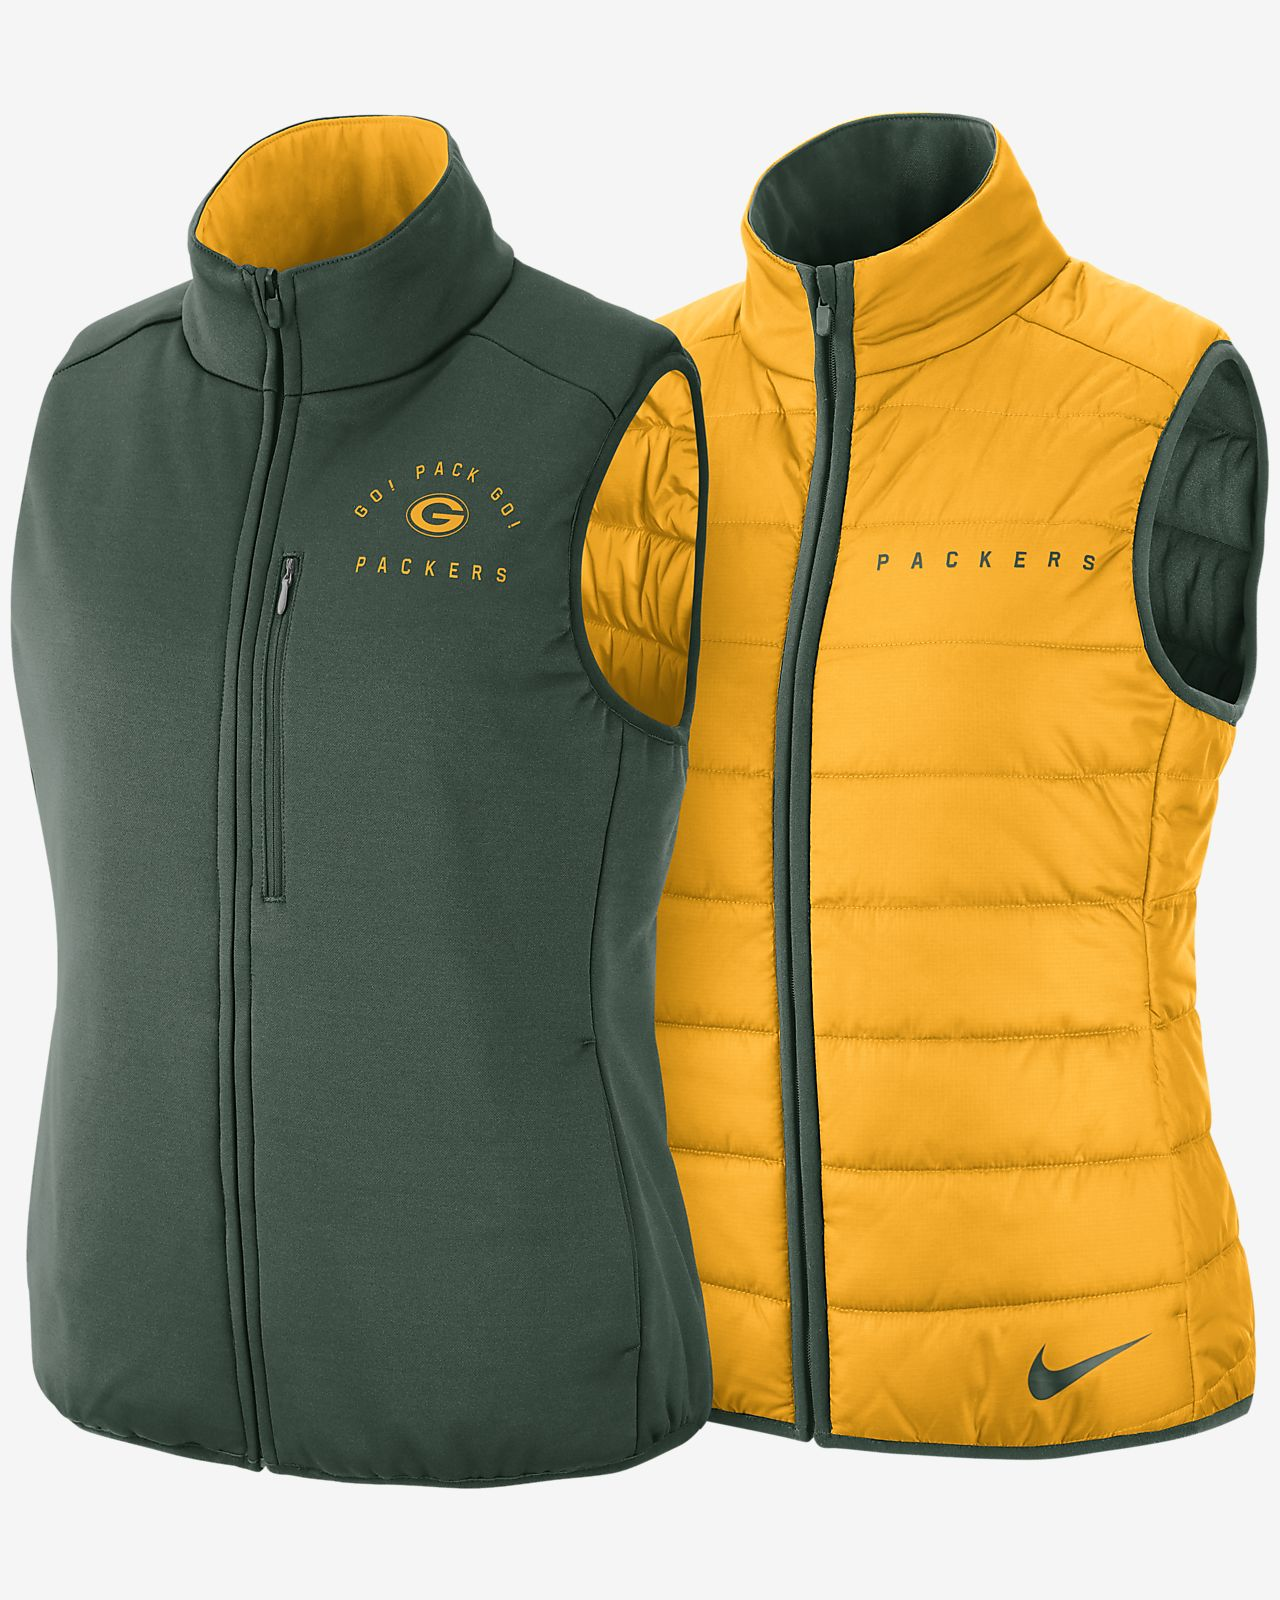 Nike (NFL Packers) Women's Reversible Vest